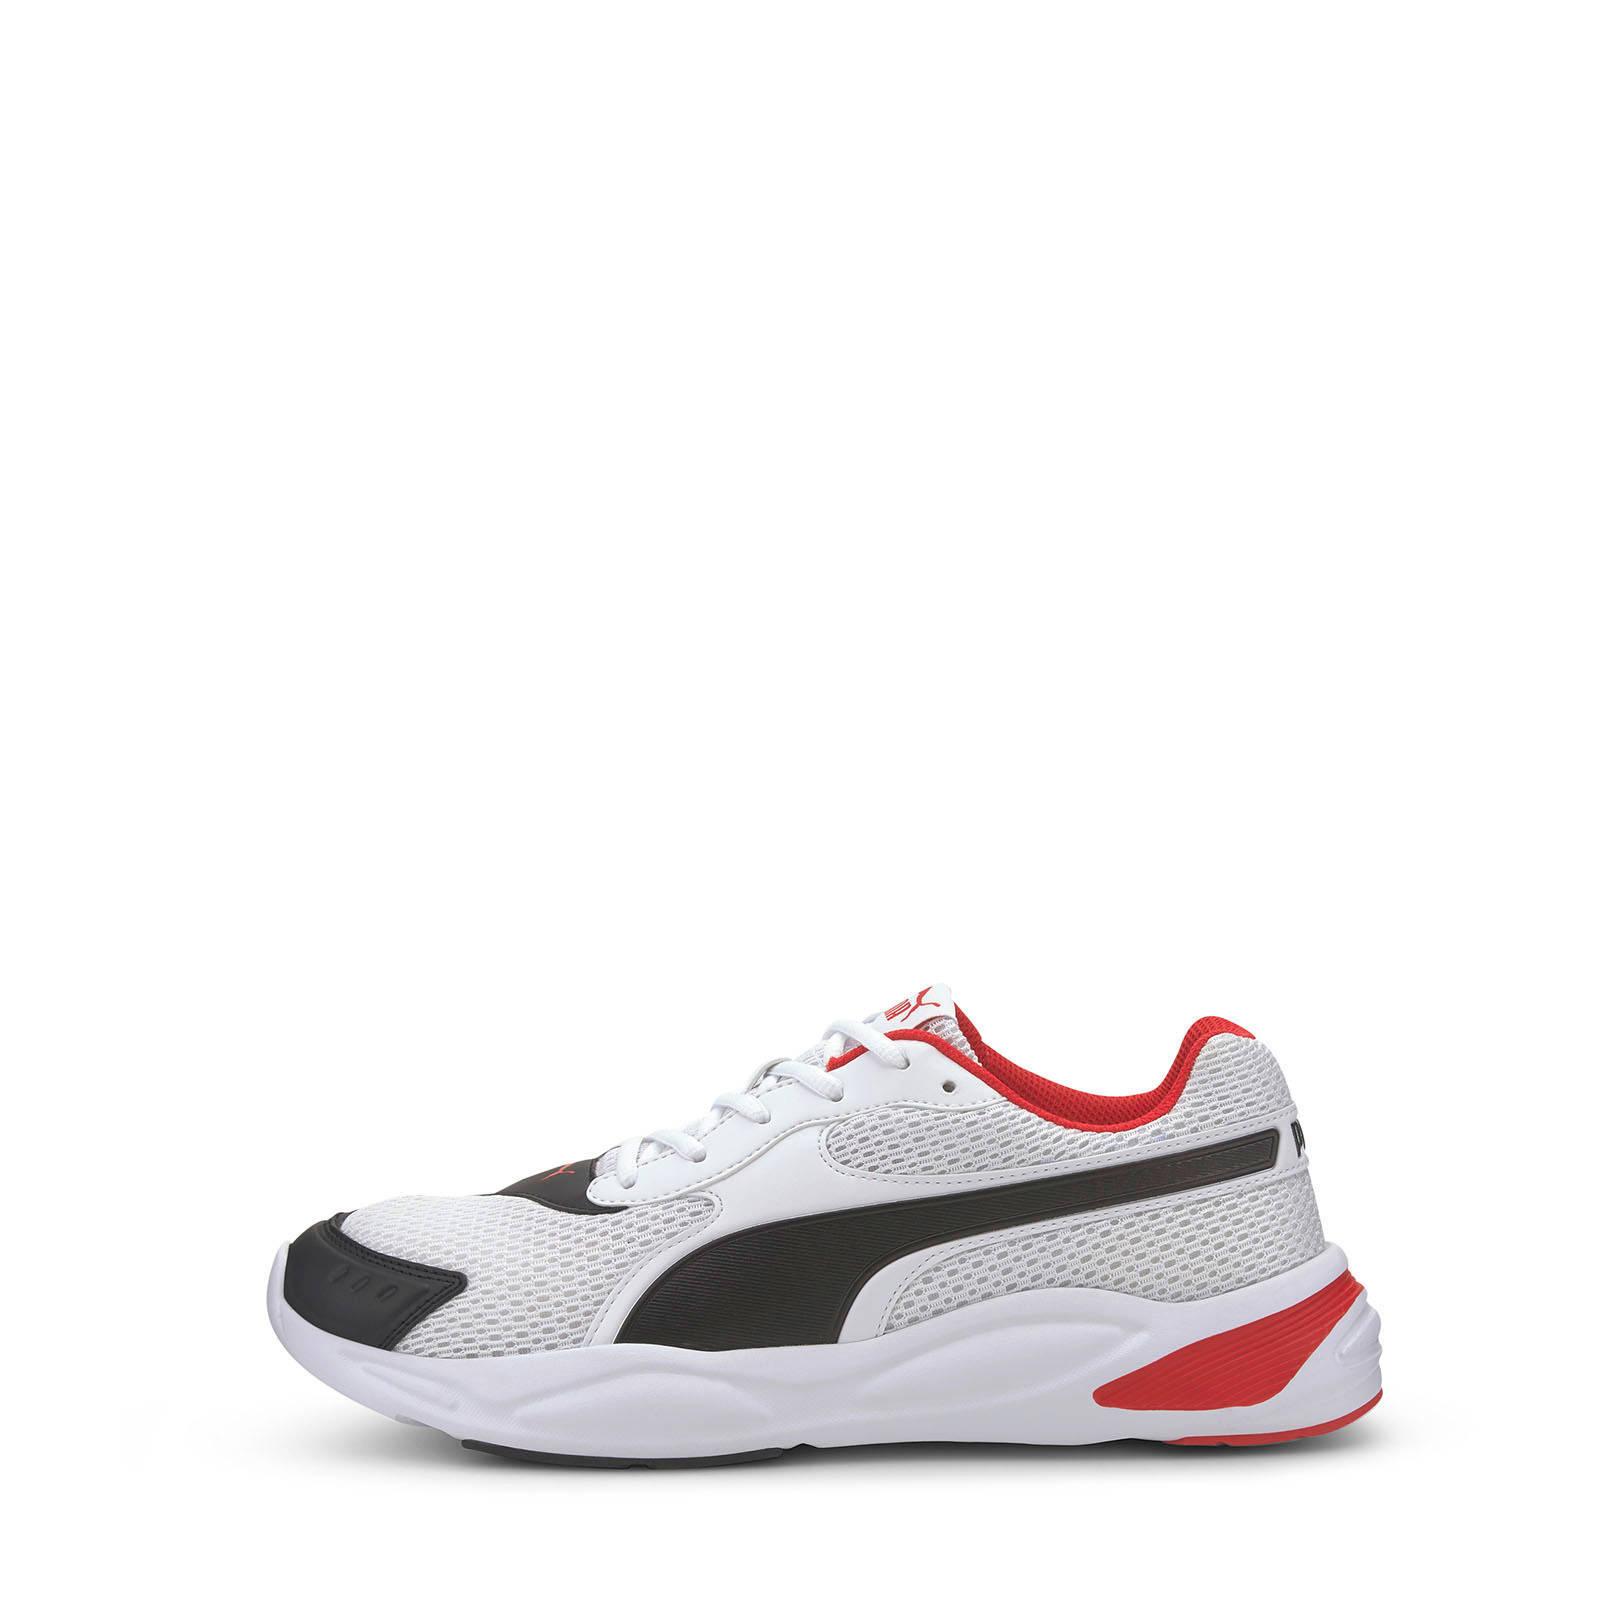 Puma 90s Runner sneakers witzwartrood | wehkamp